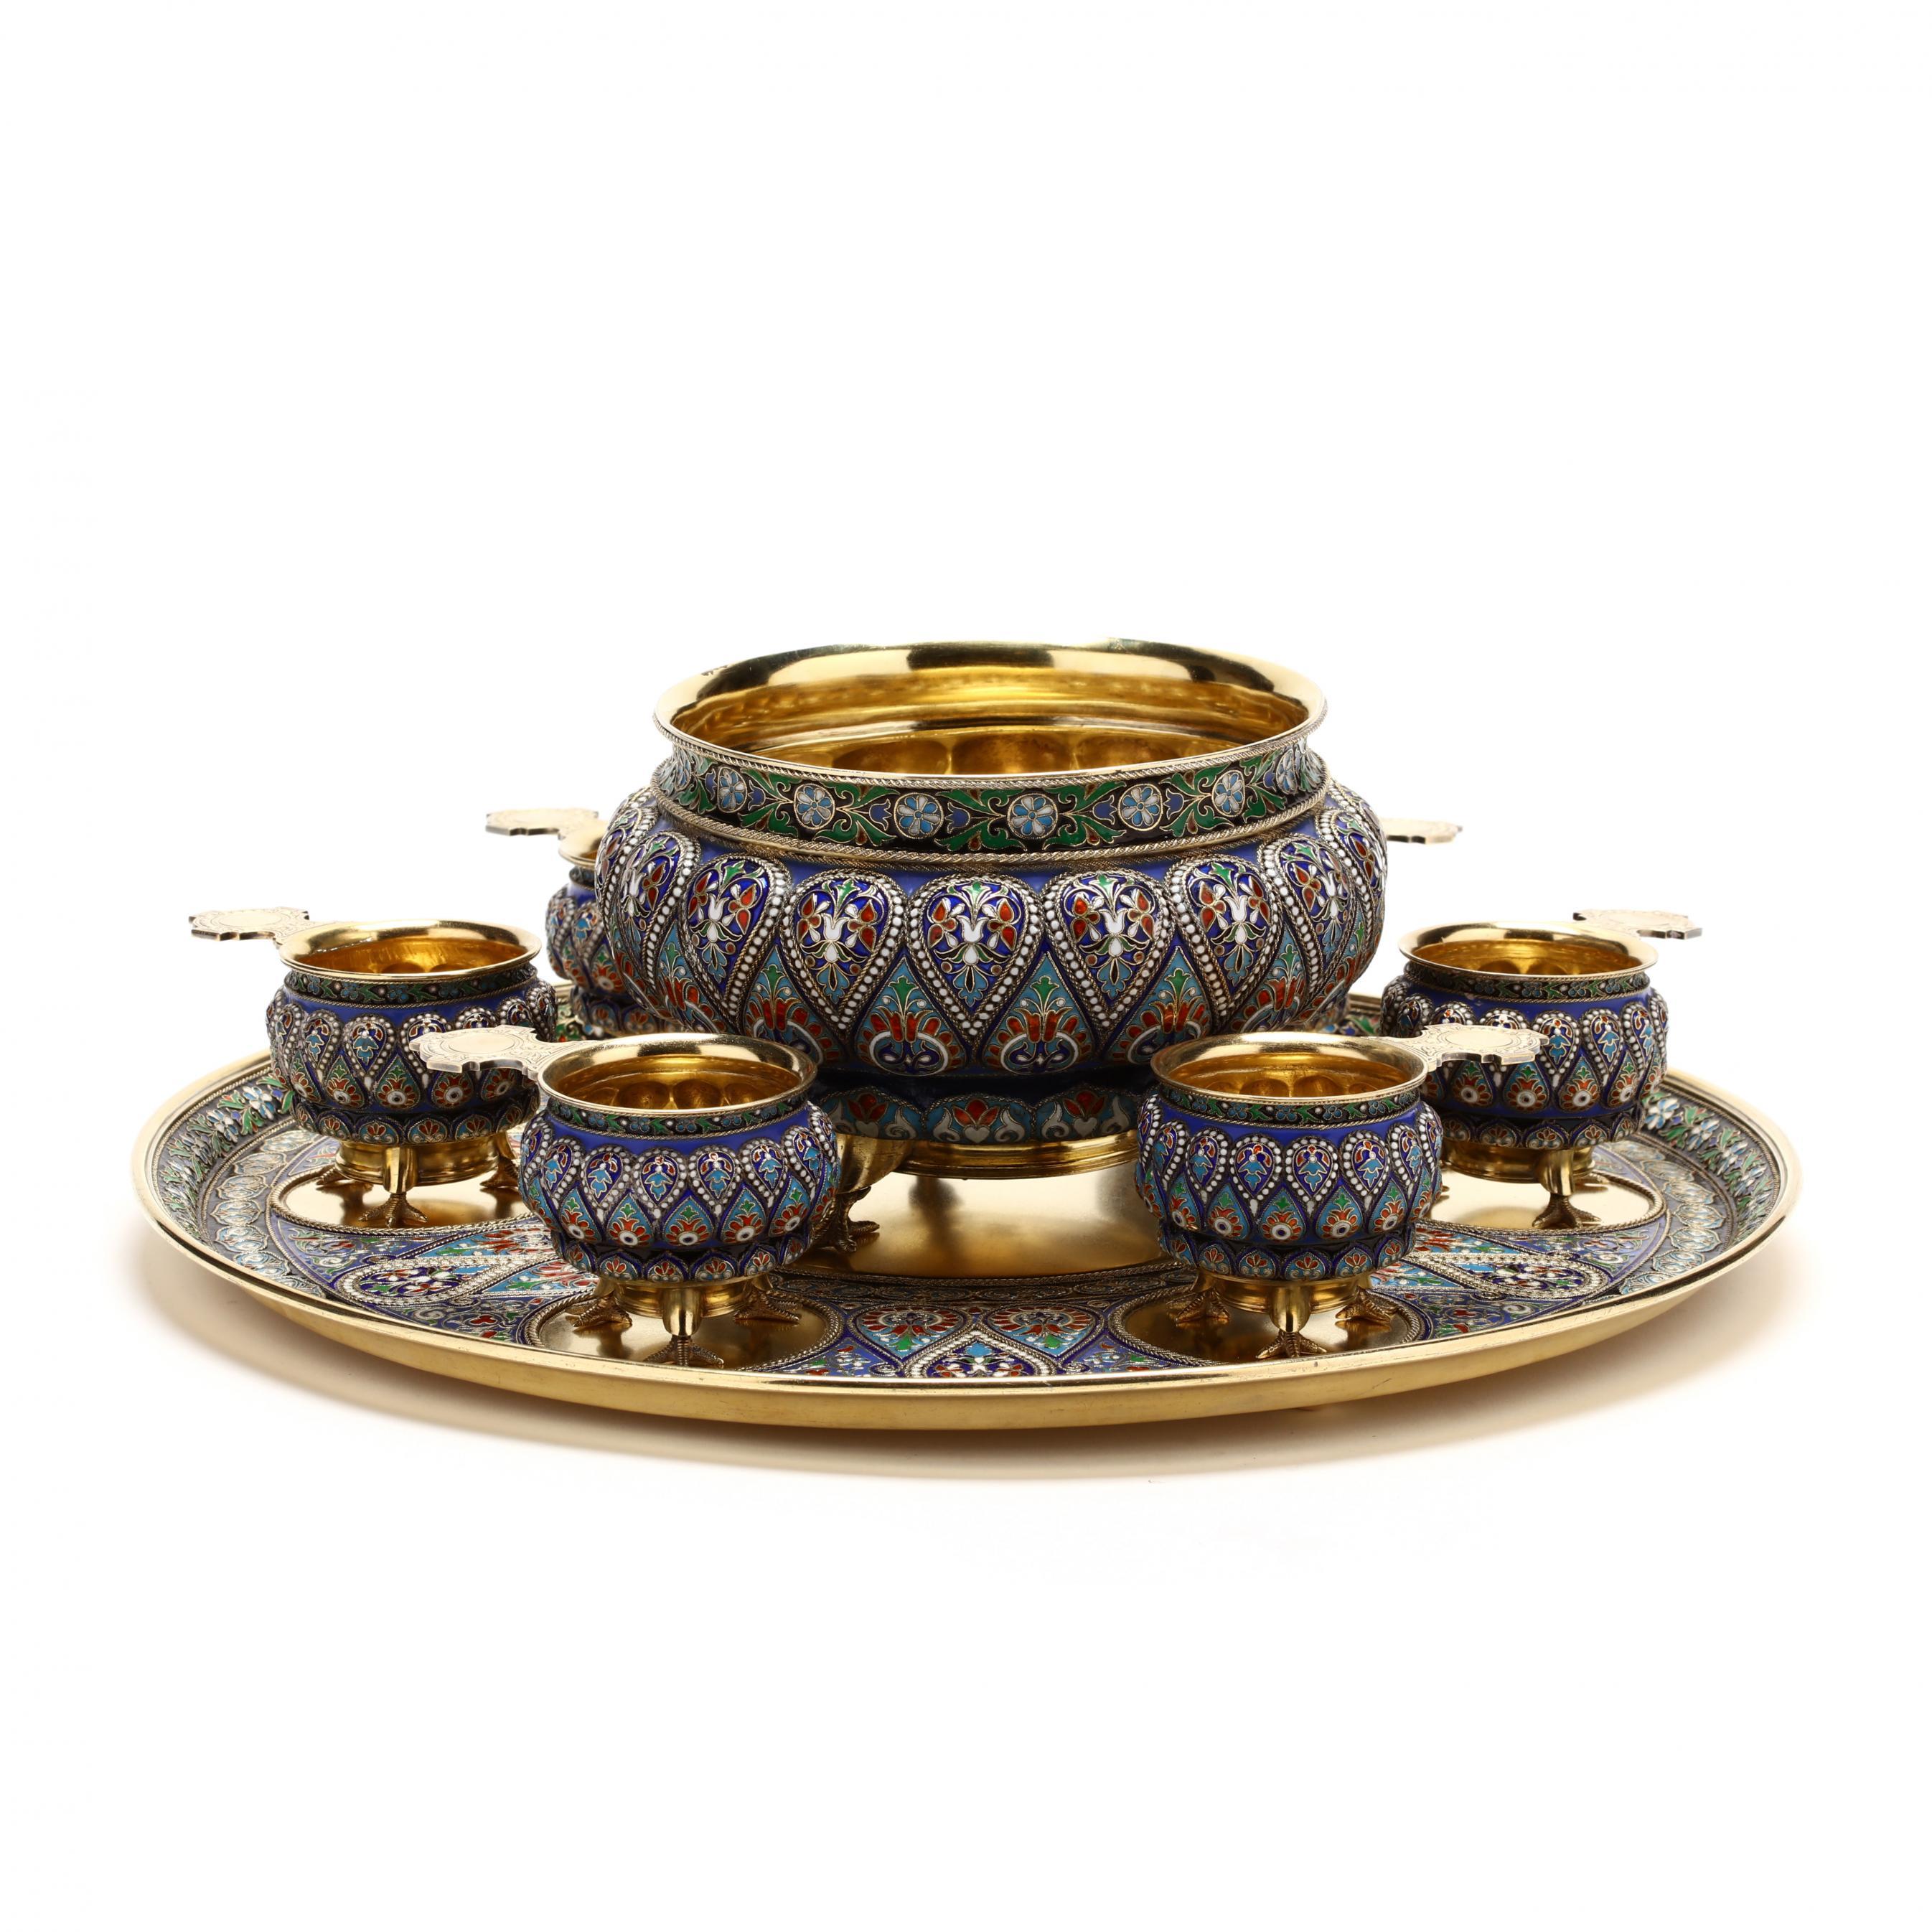 a-silver-gilt-and-cloisonne-enamel-punch-set-ivan-khlebnikov